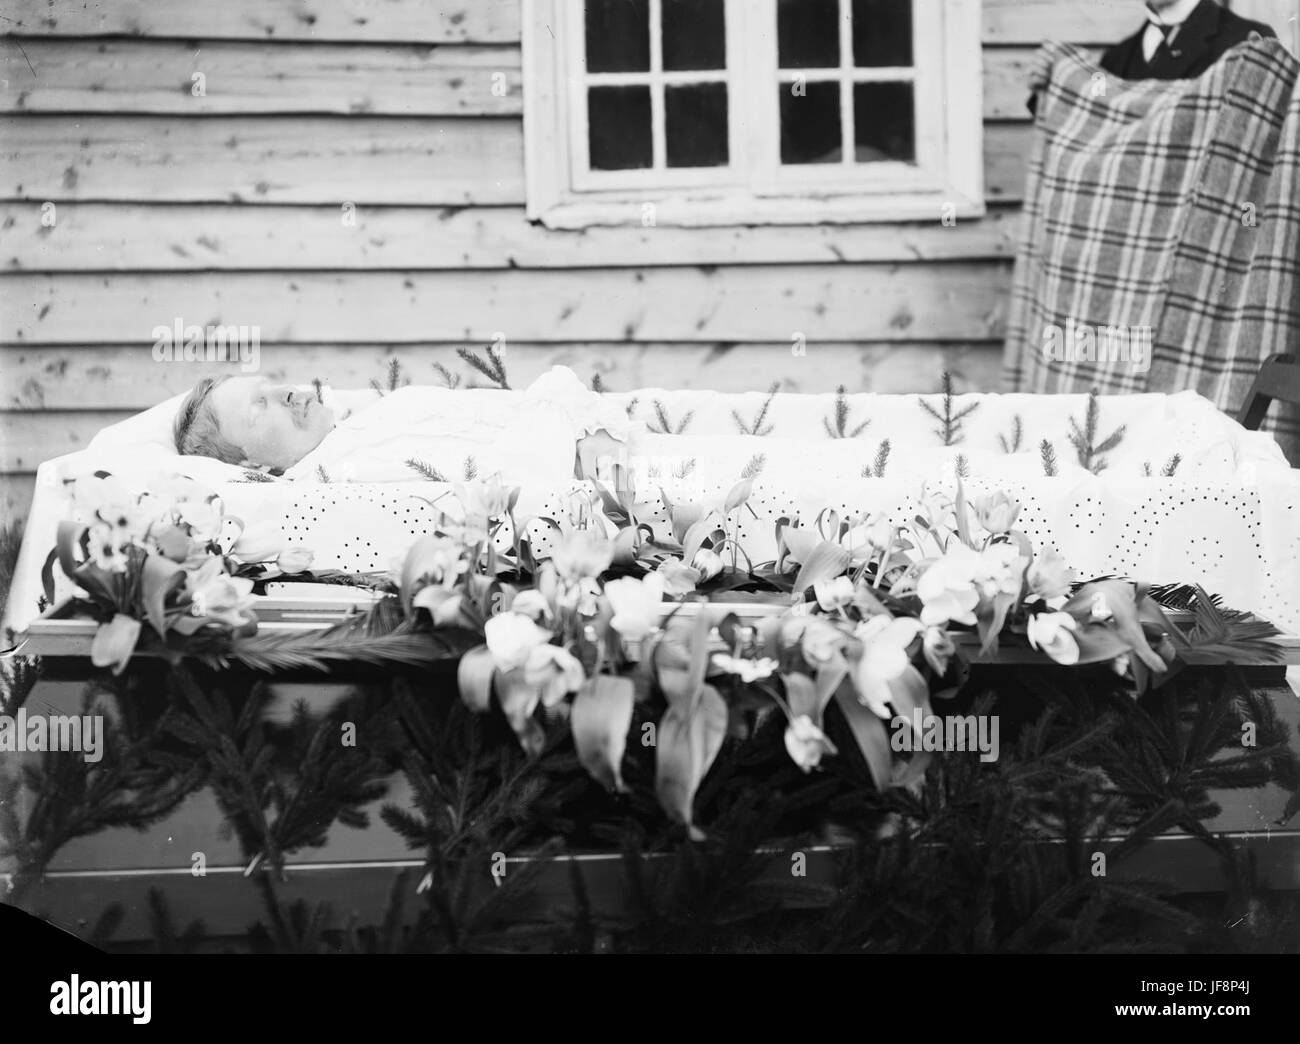 Post mortem portrait, ca 1912-1930 32755331973 o - Stock Image